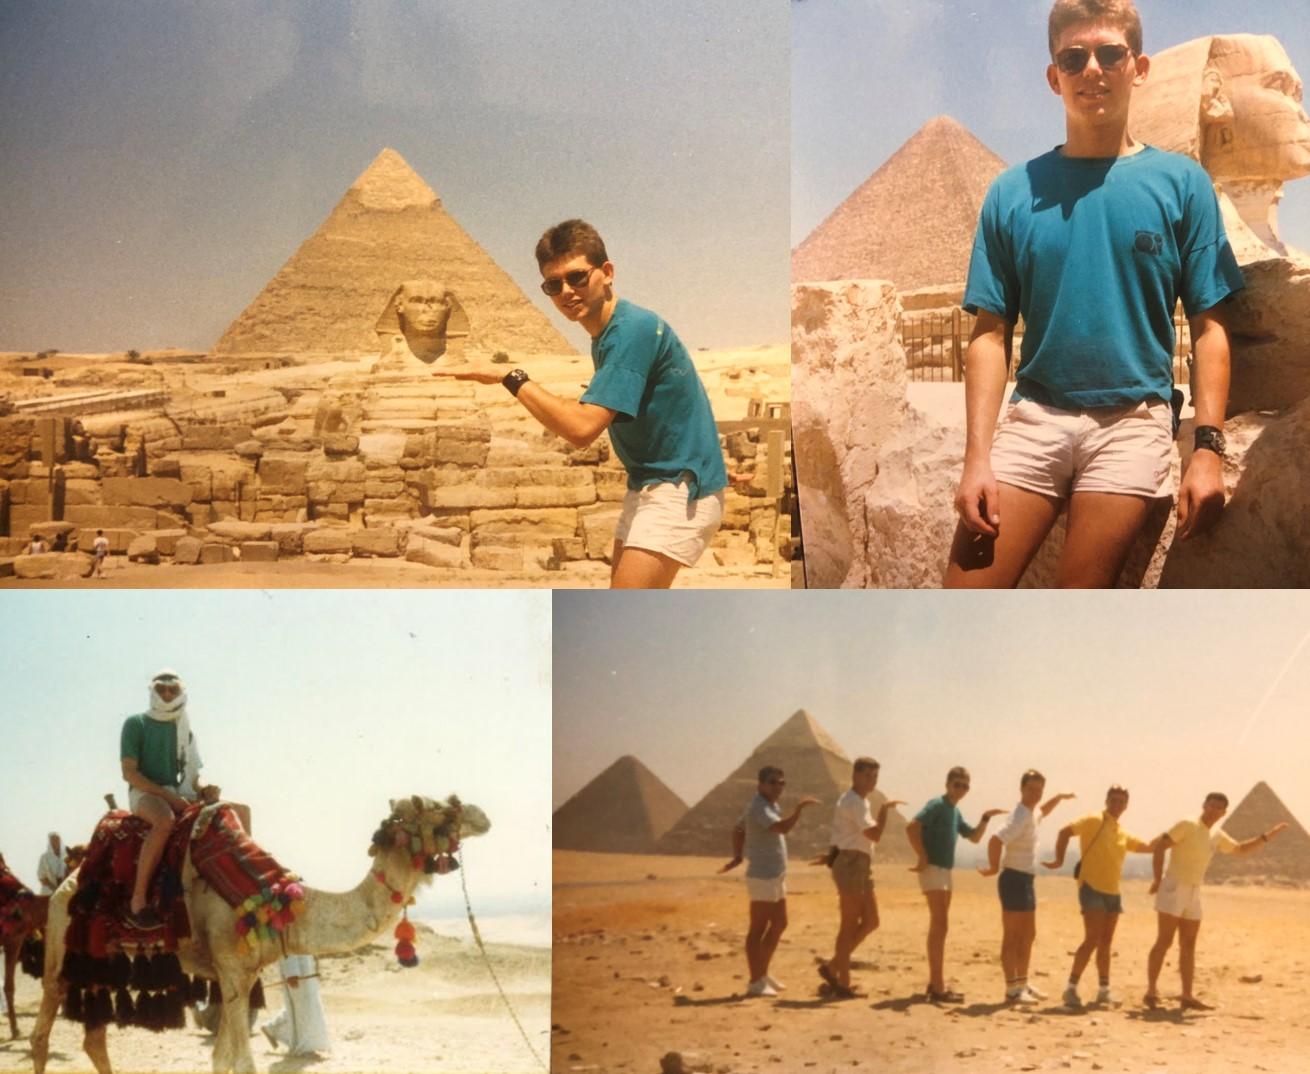 Cairo, Egypt 1987